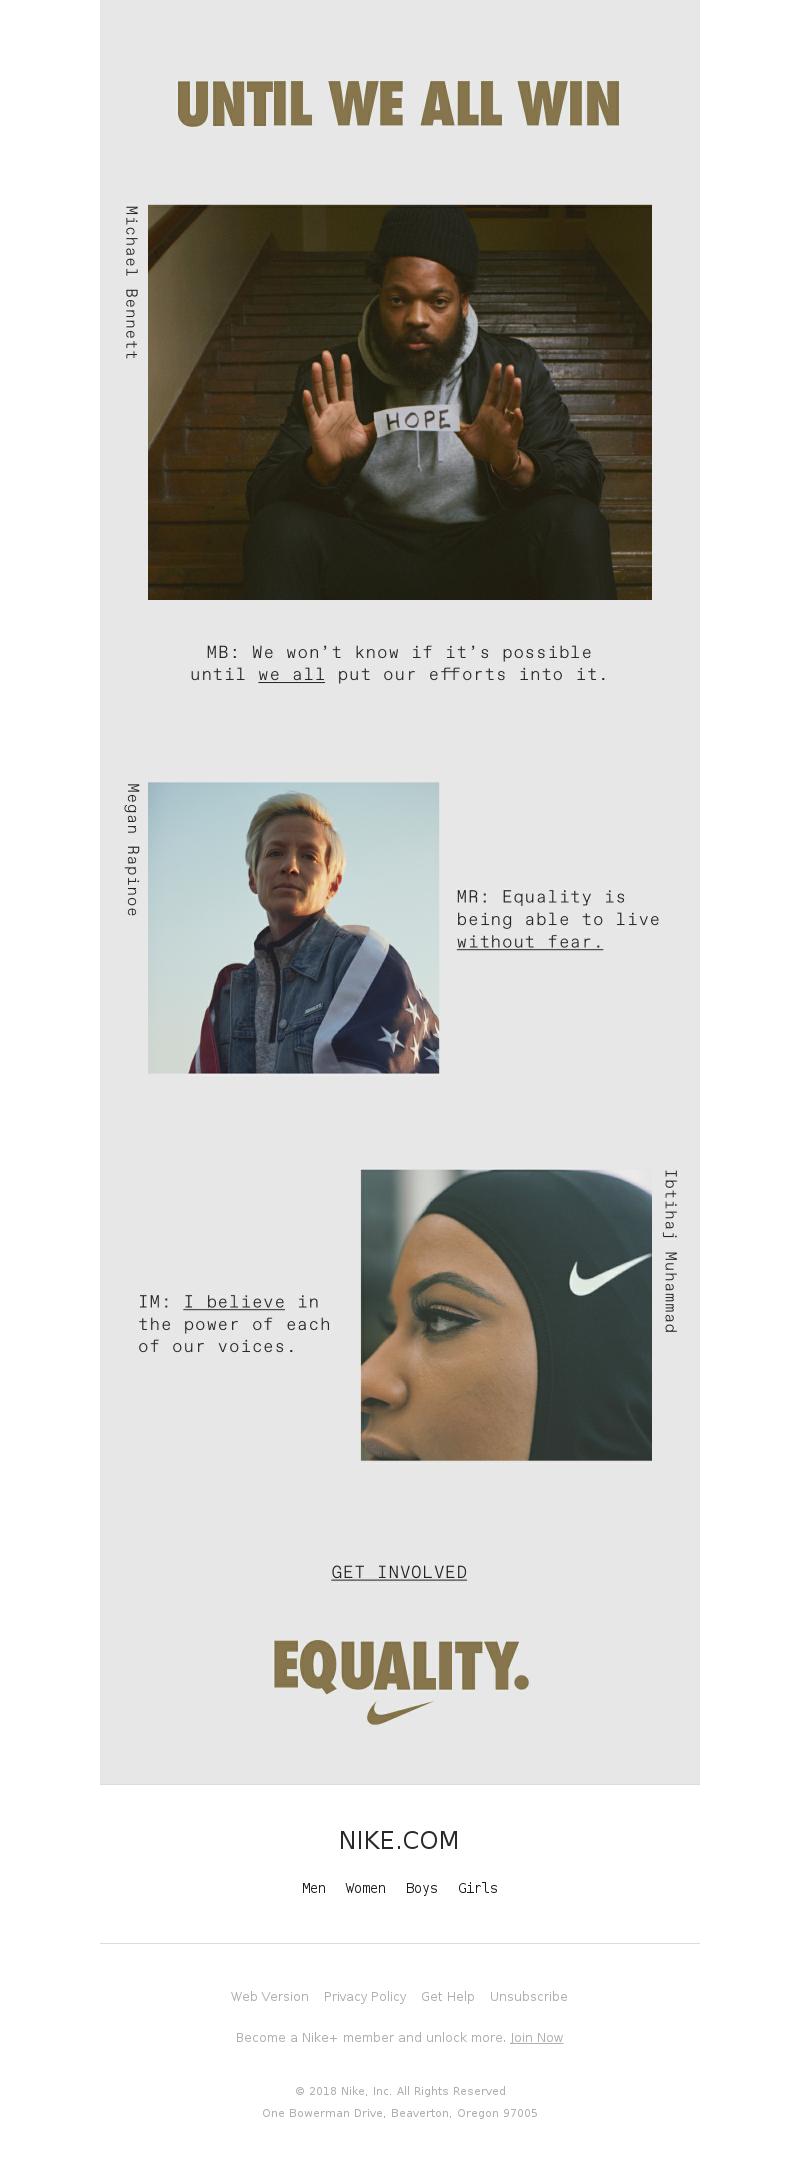 Nike - EQUALITY.